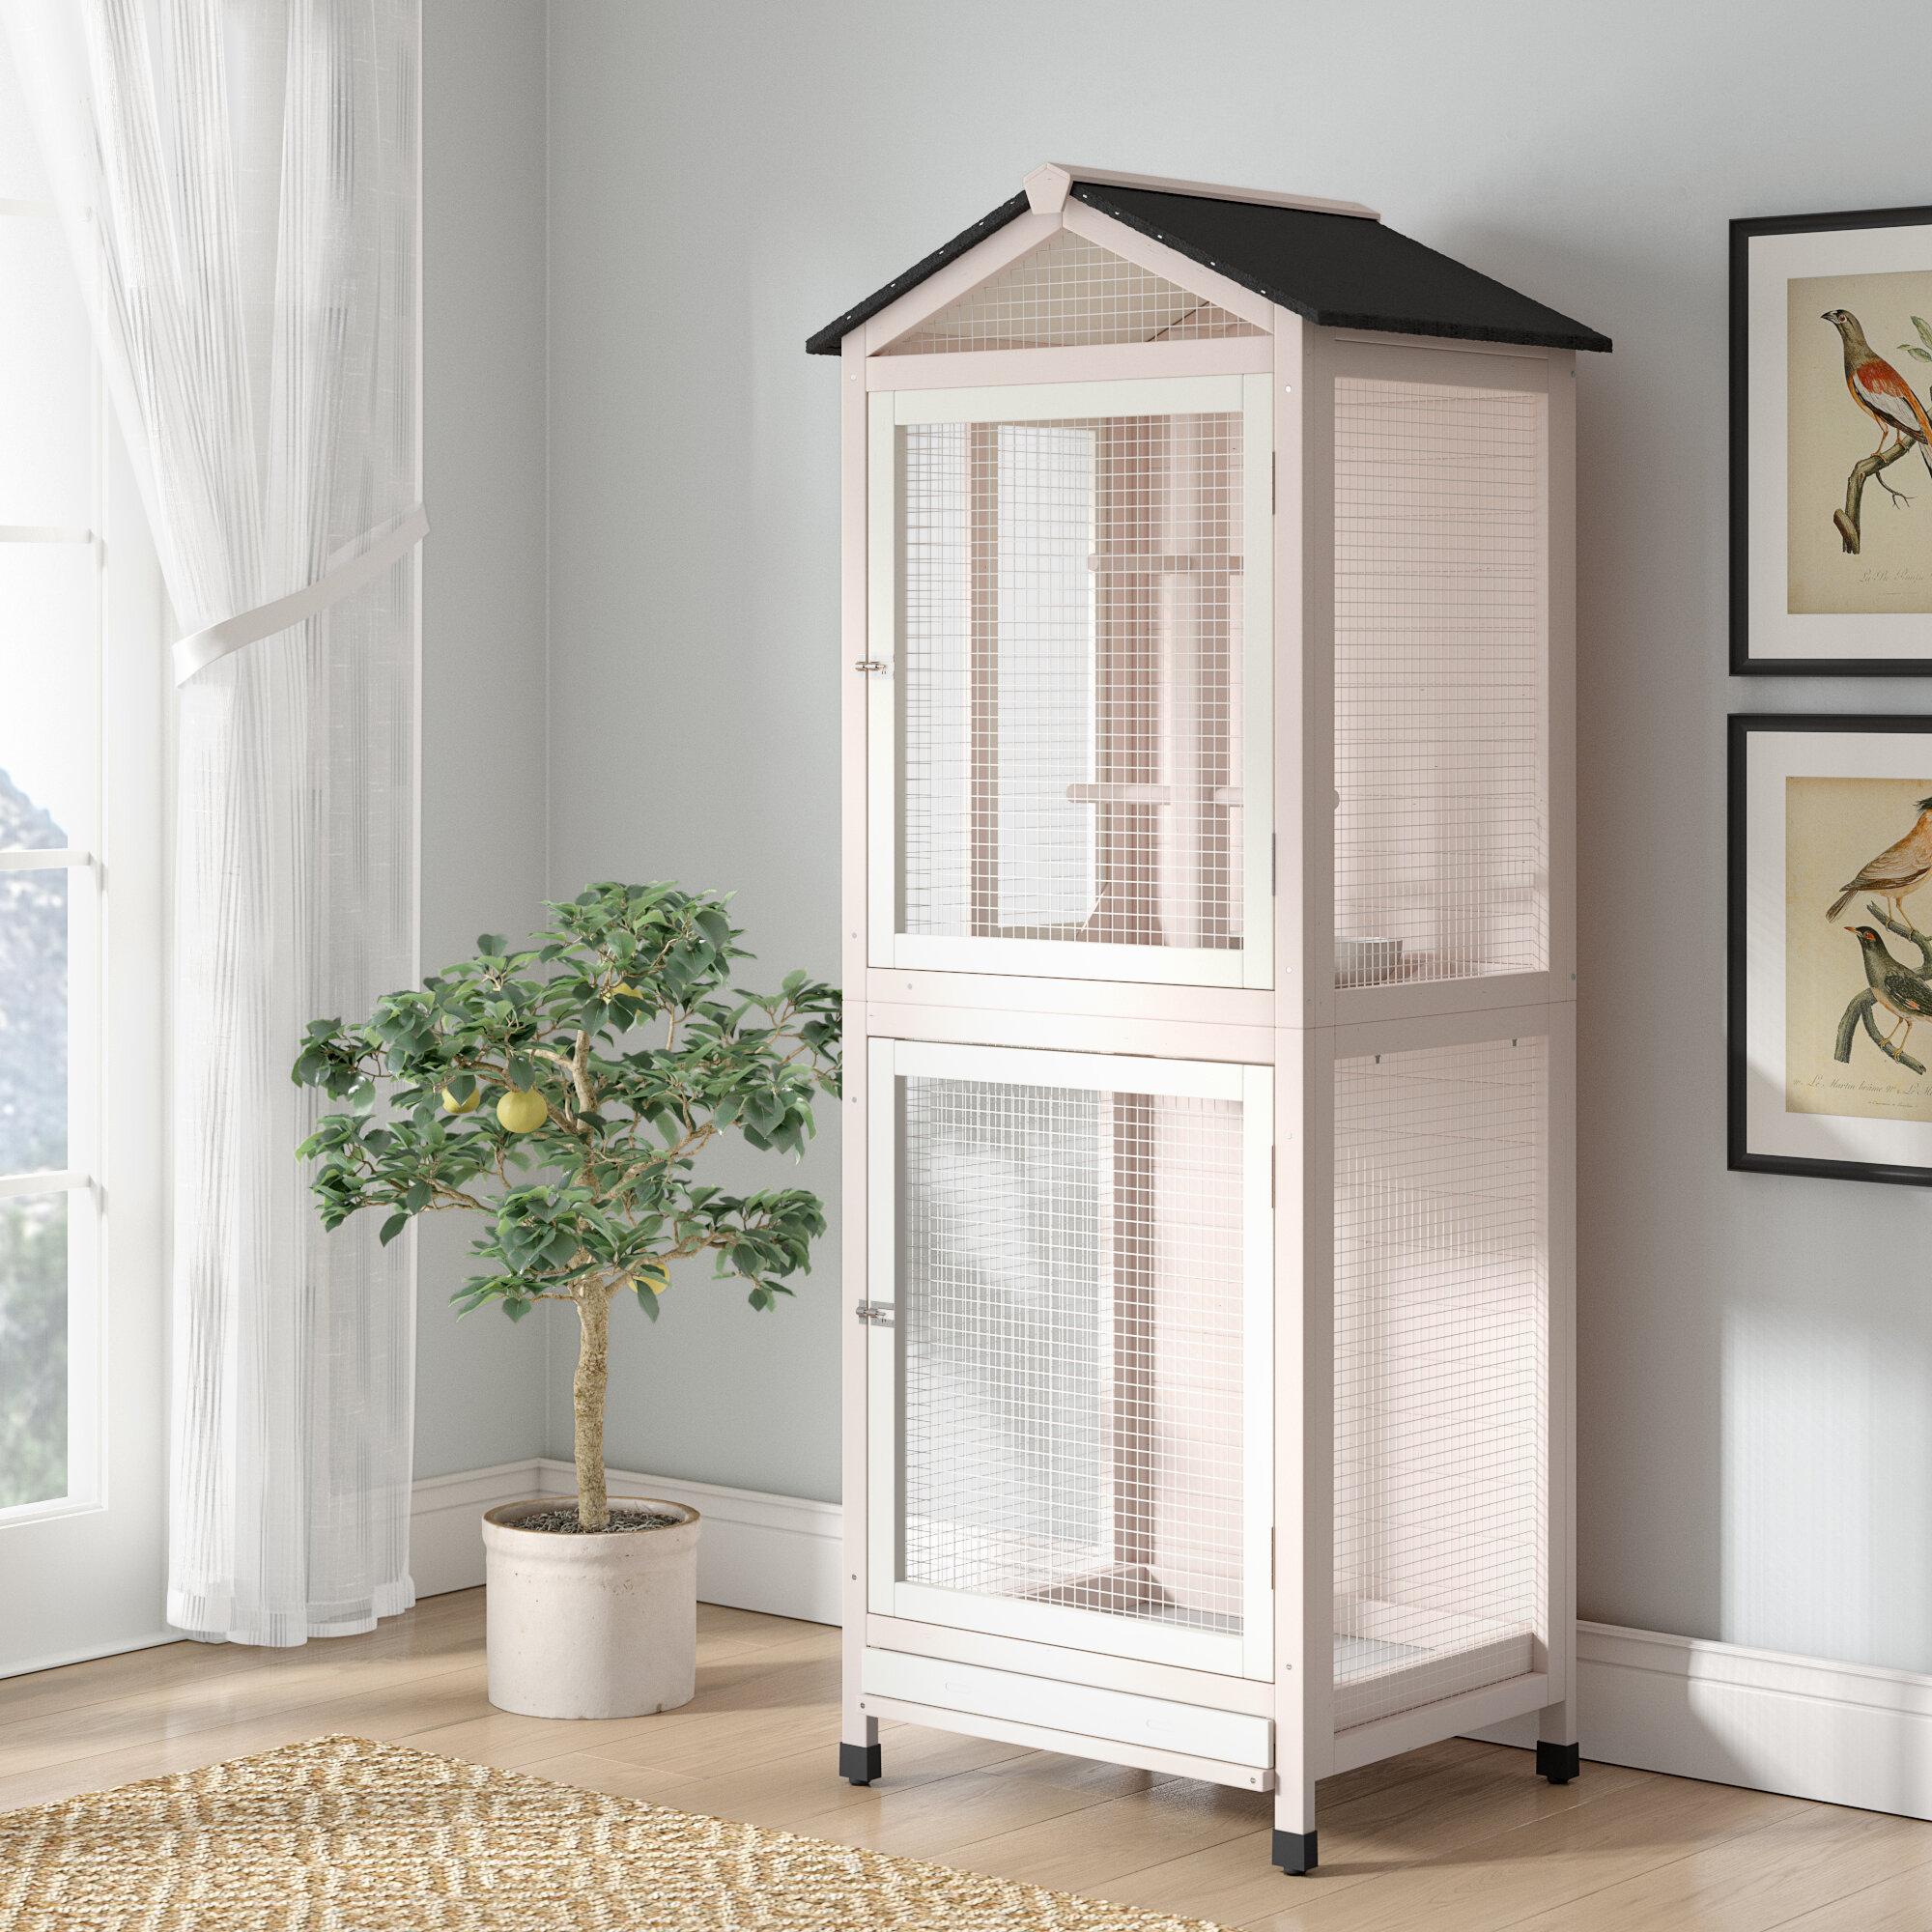 Parakeet Bird Cages You'll Love in 2019 | Wayfair